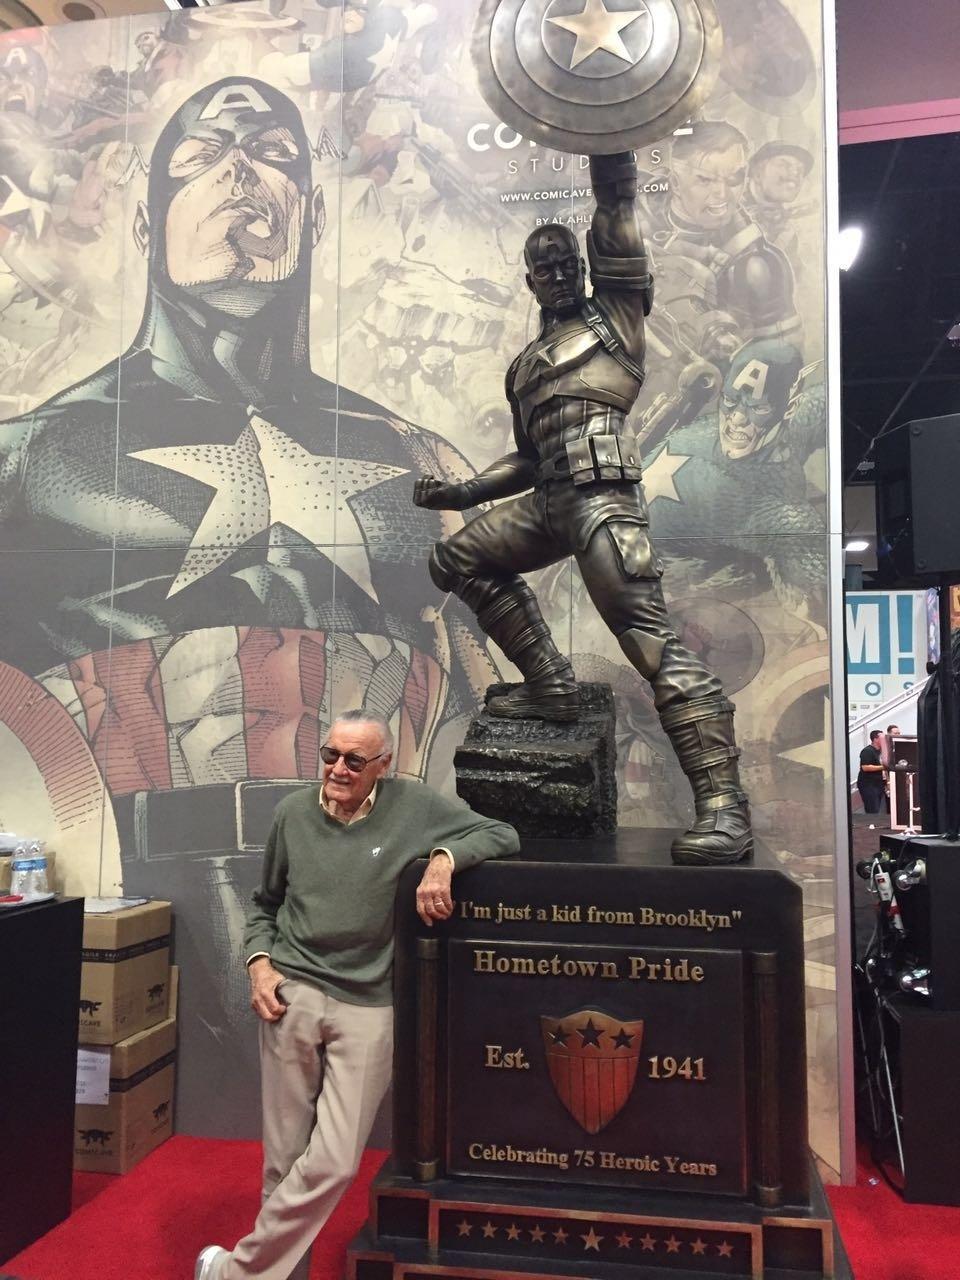 24.jul.2016 - Stan Lee passeia pelo estande da Marvel durante a San Diego Comic-Con 2016